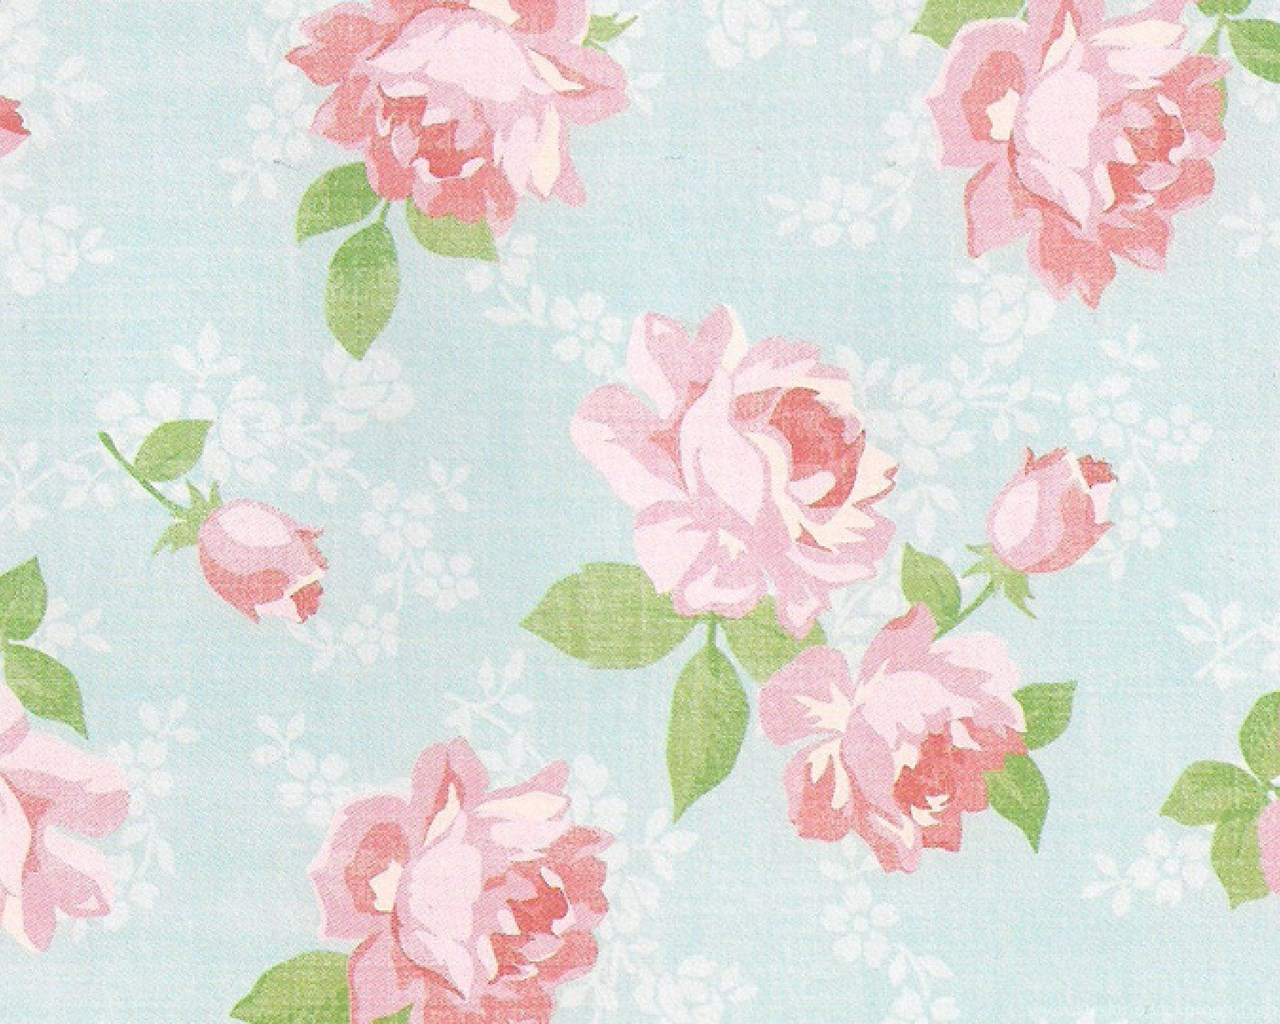 Floral Ipad Wallpapers Tumblr Desktop Background